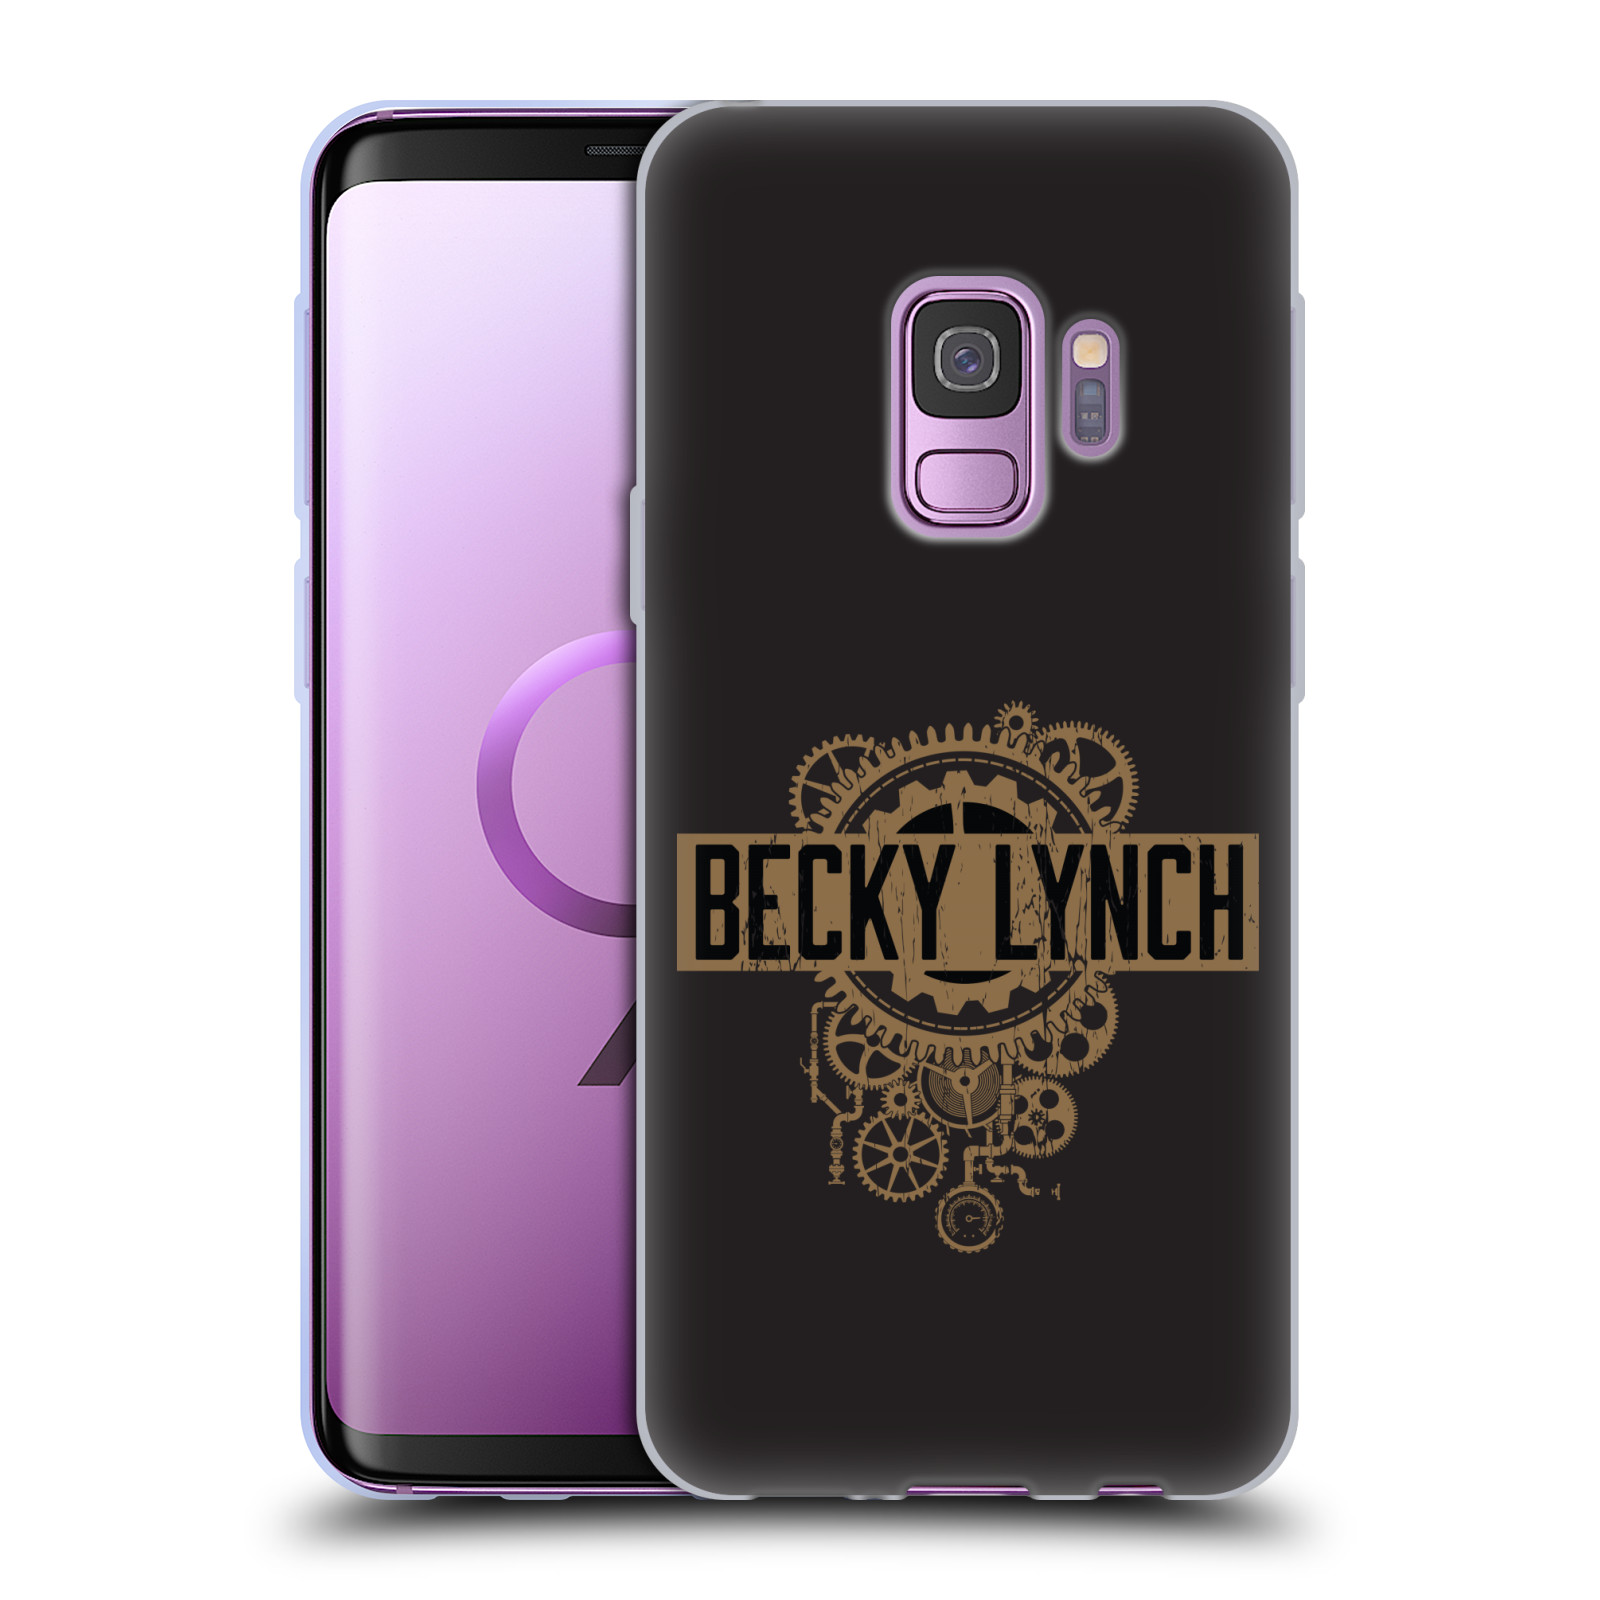 Officiel-WWE-Becky-Lynch-GEL-SOUPLE-CASE-Pour-SAMSUNG-Phone-1